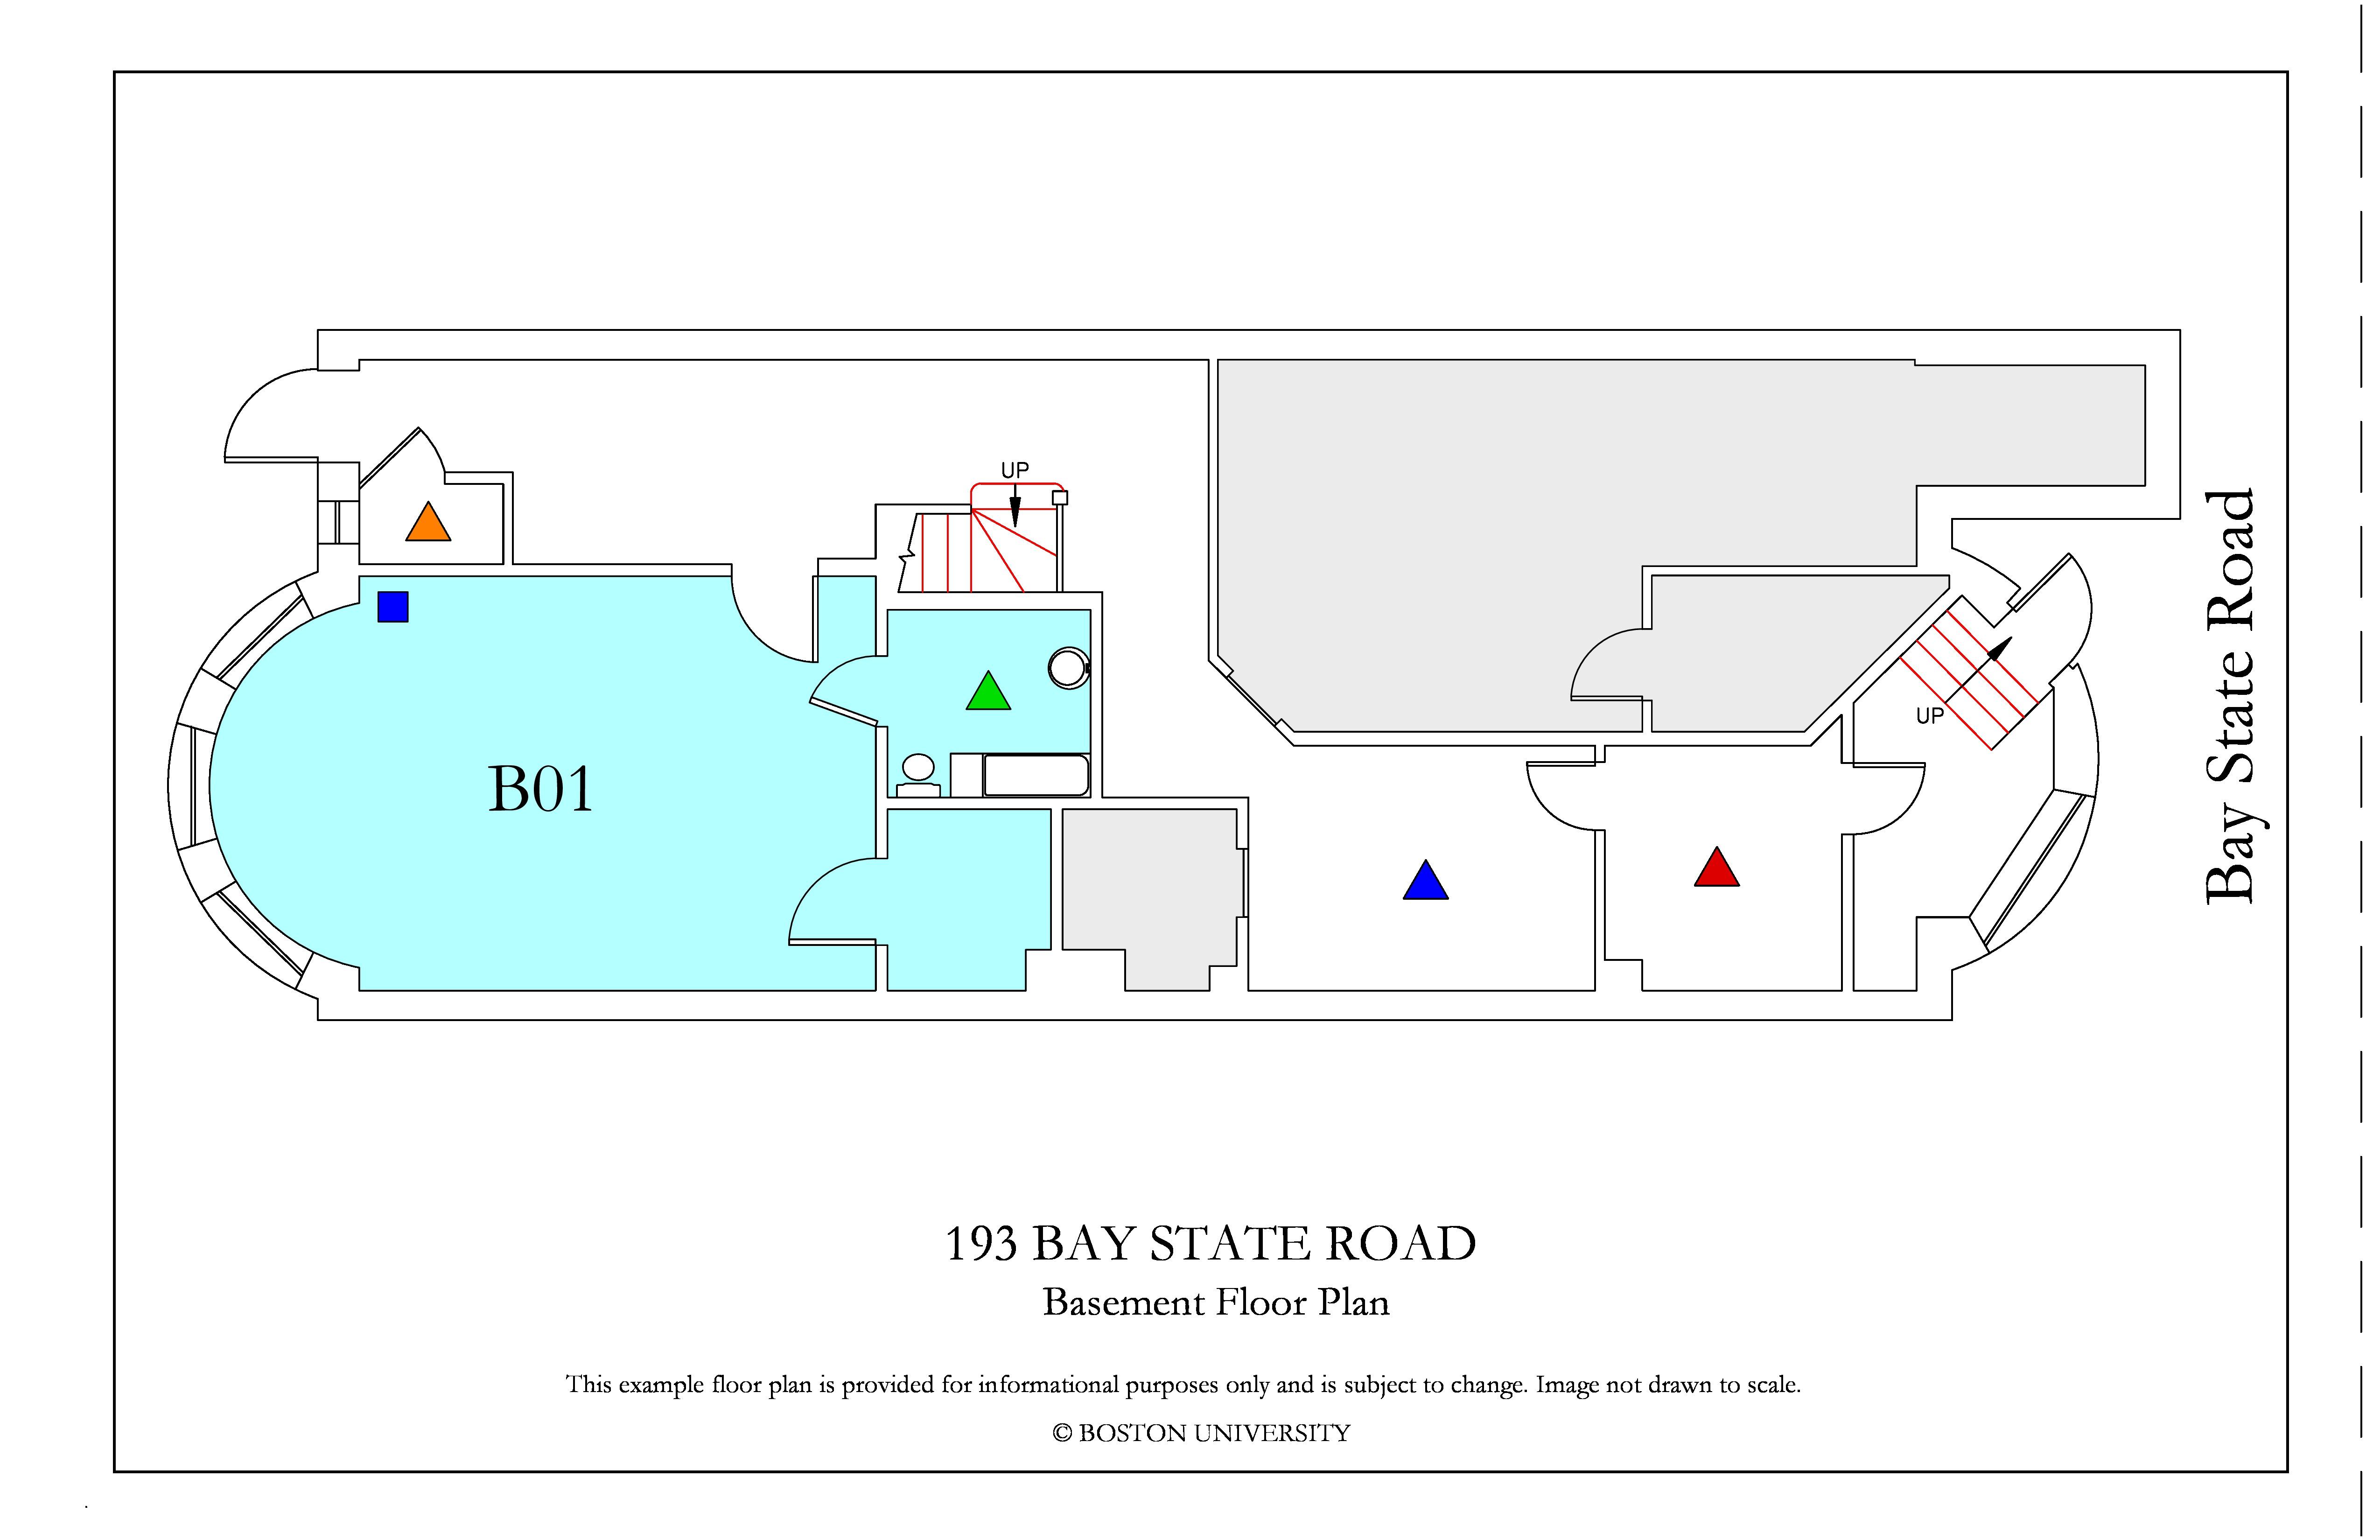 193 Bay State Road_BasementFloor